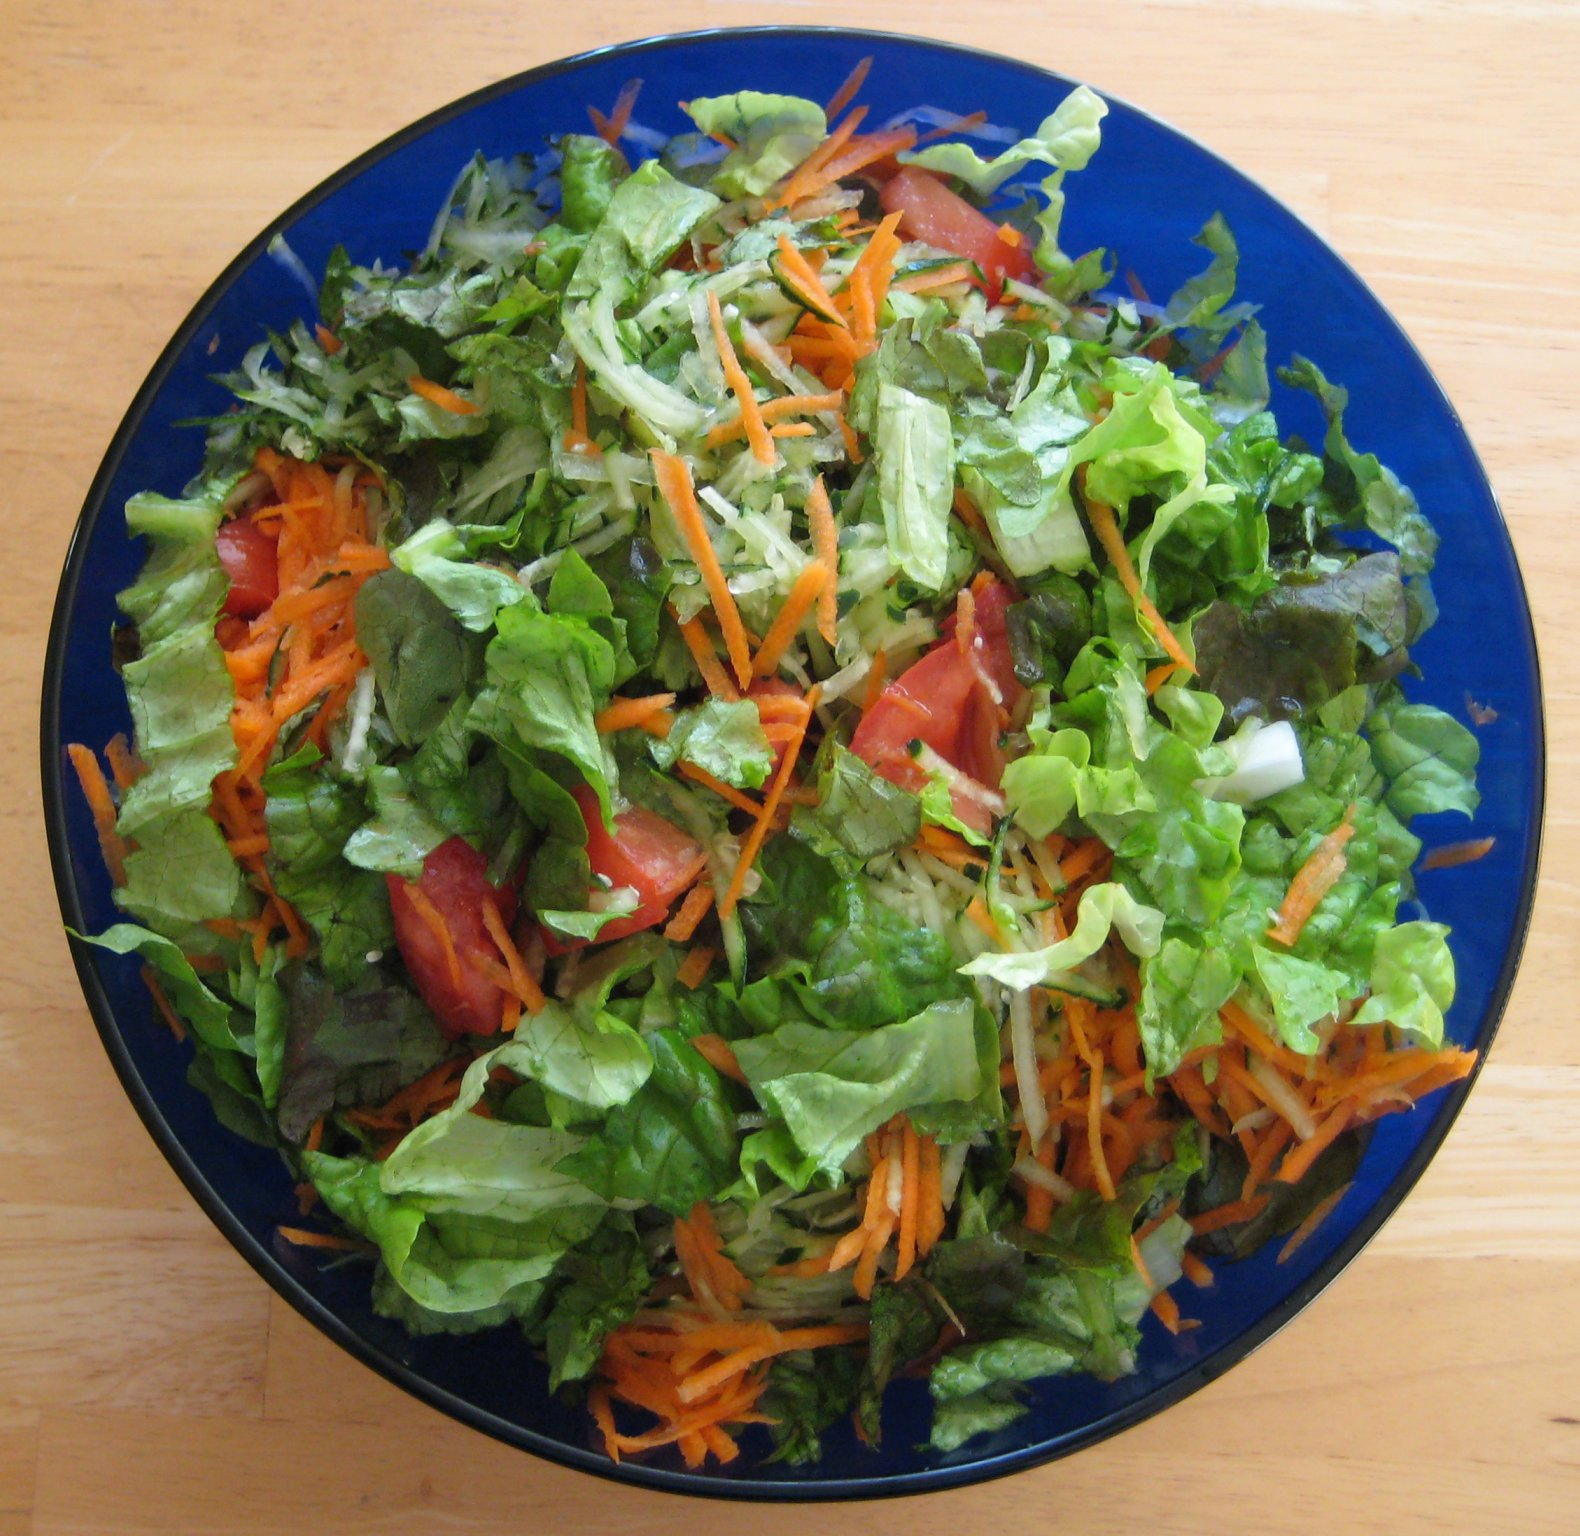 Salad plain